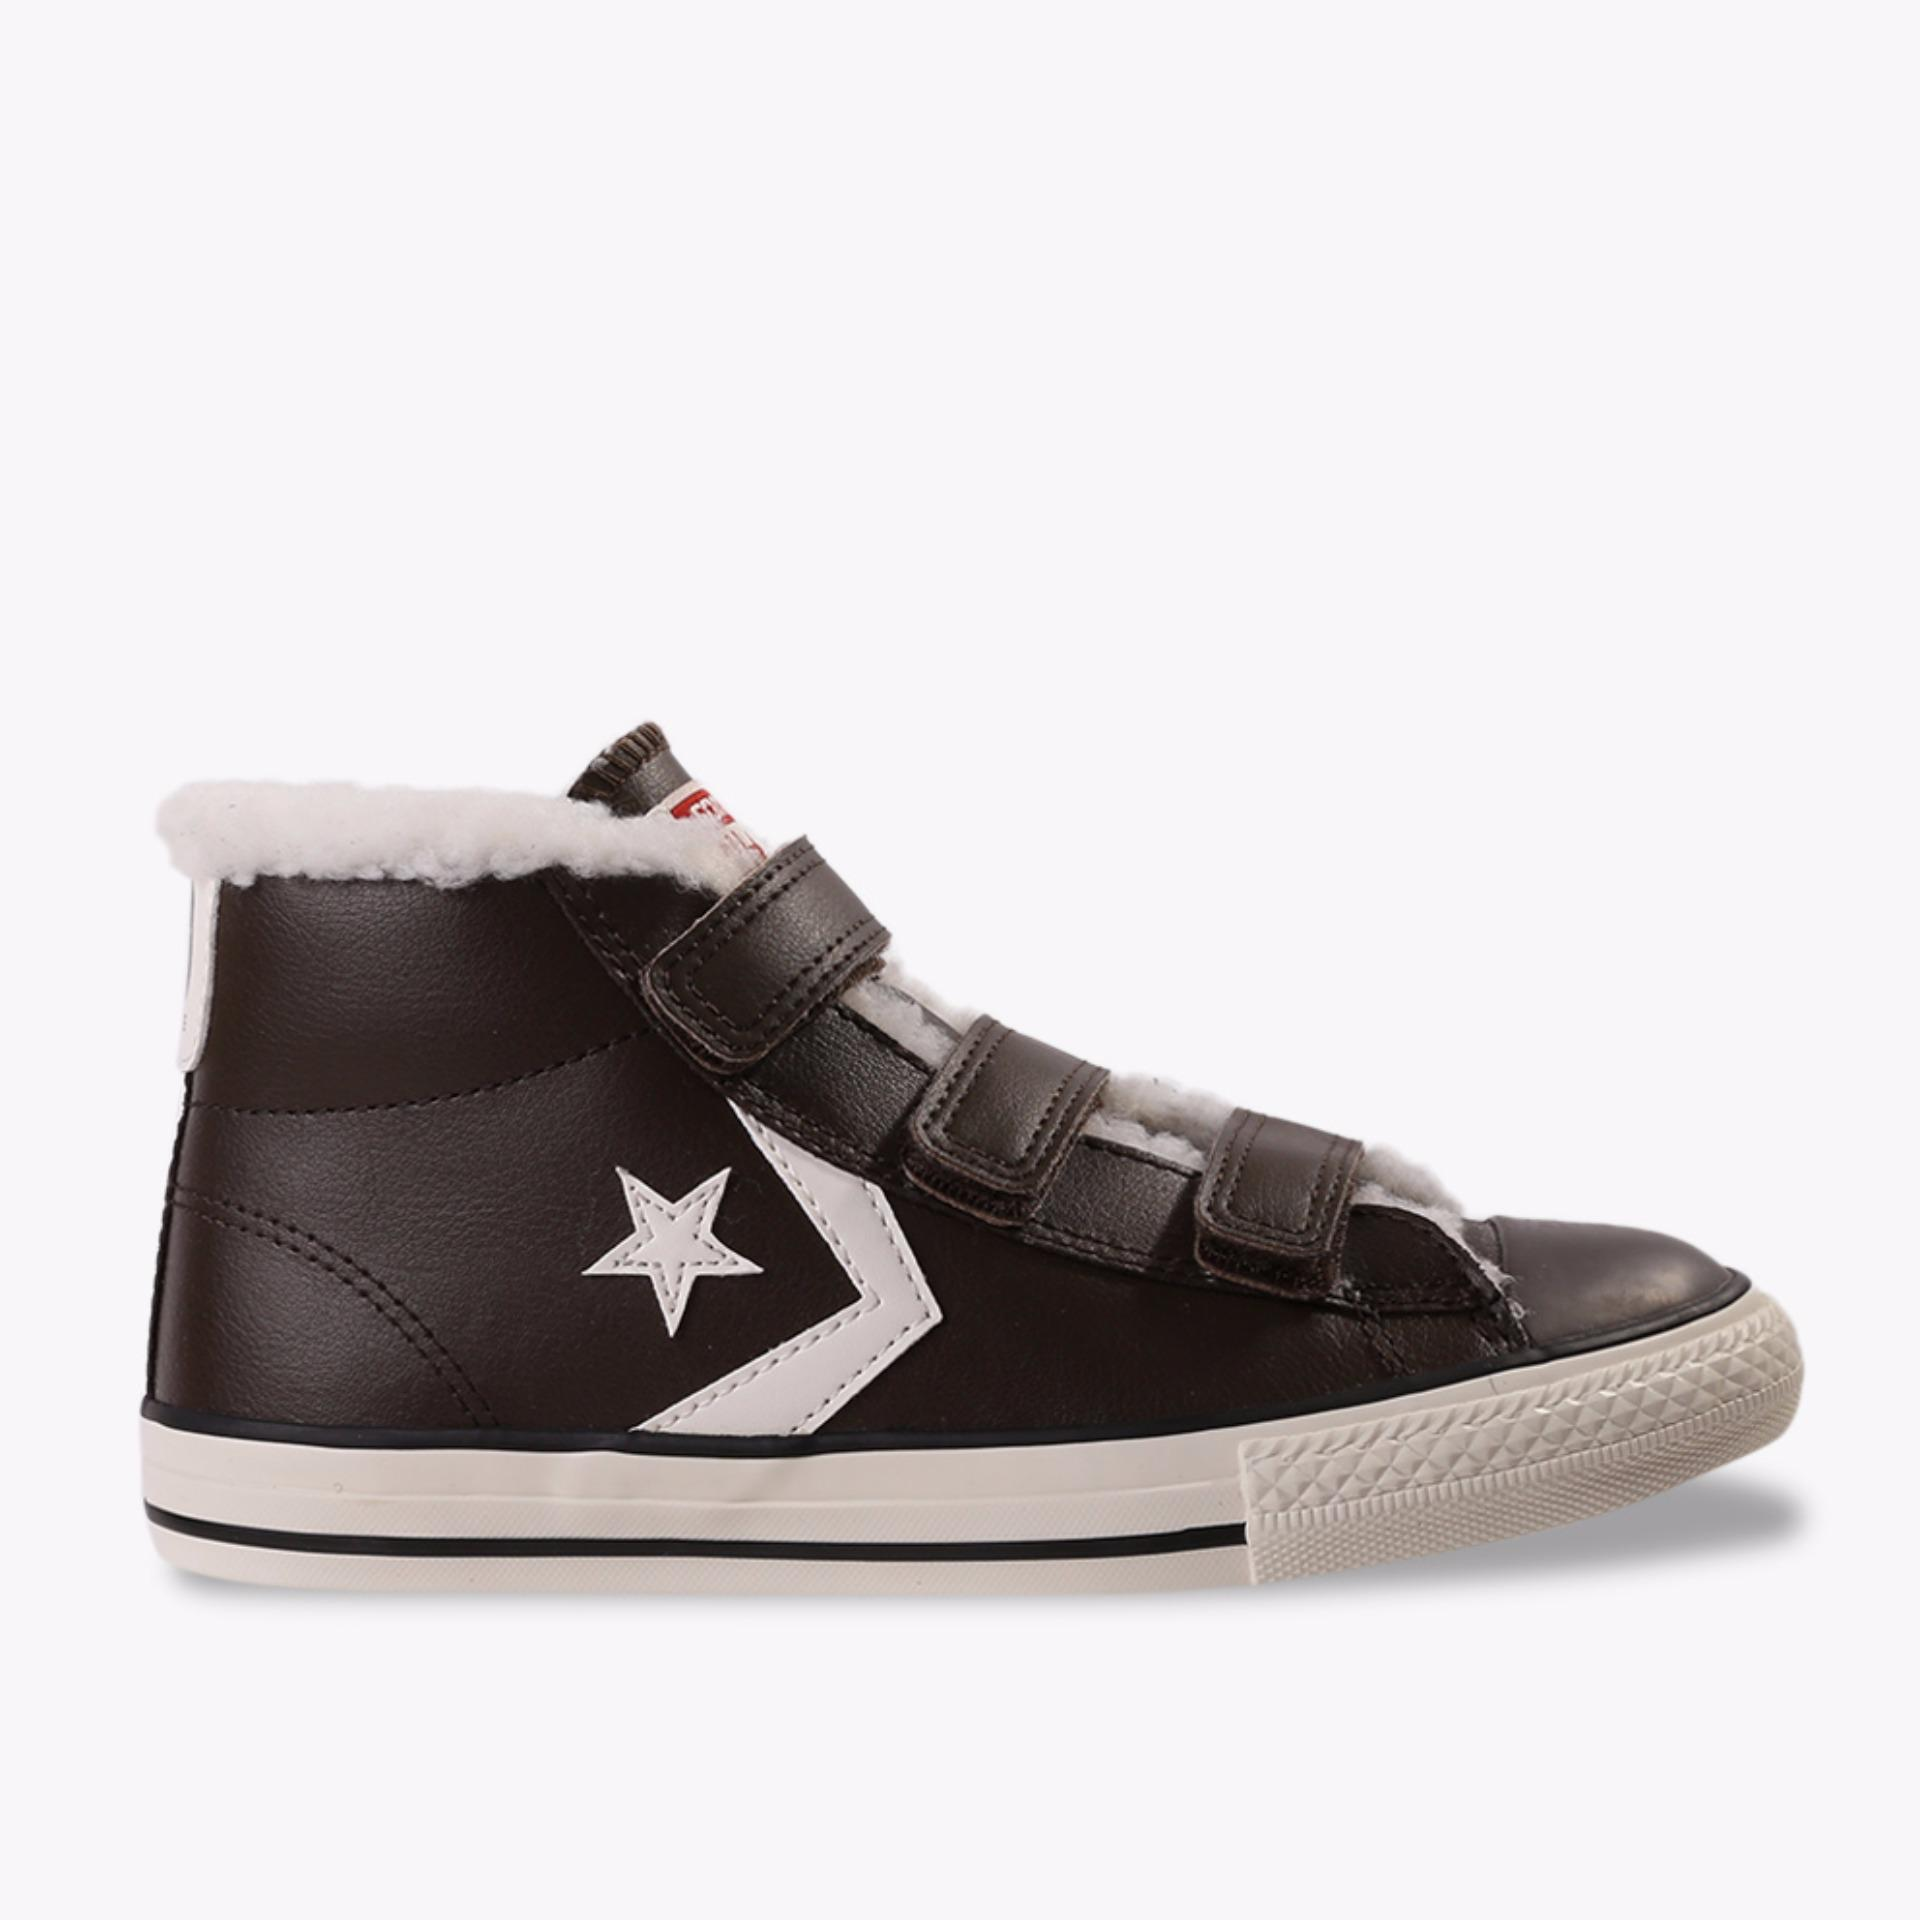 Converse Star Player EV 3V Mid Kids Sneakers Shoes - Cokelat